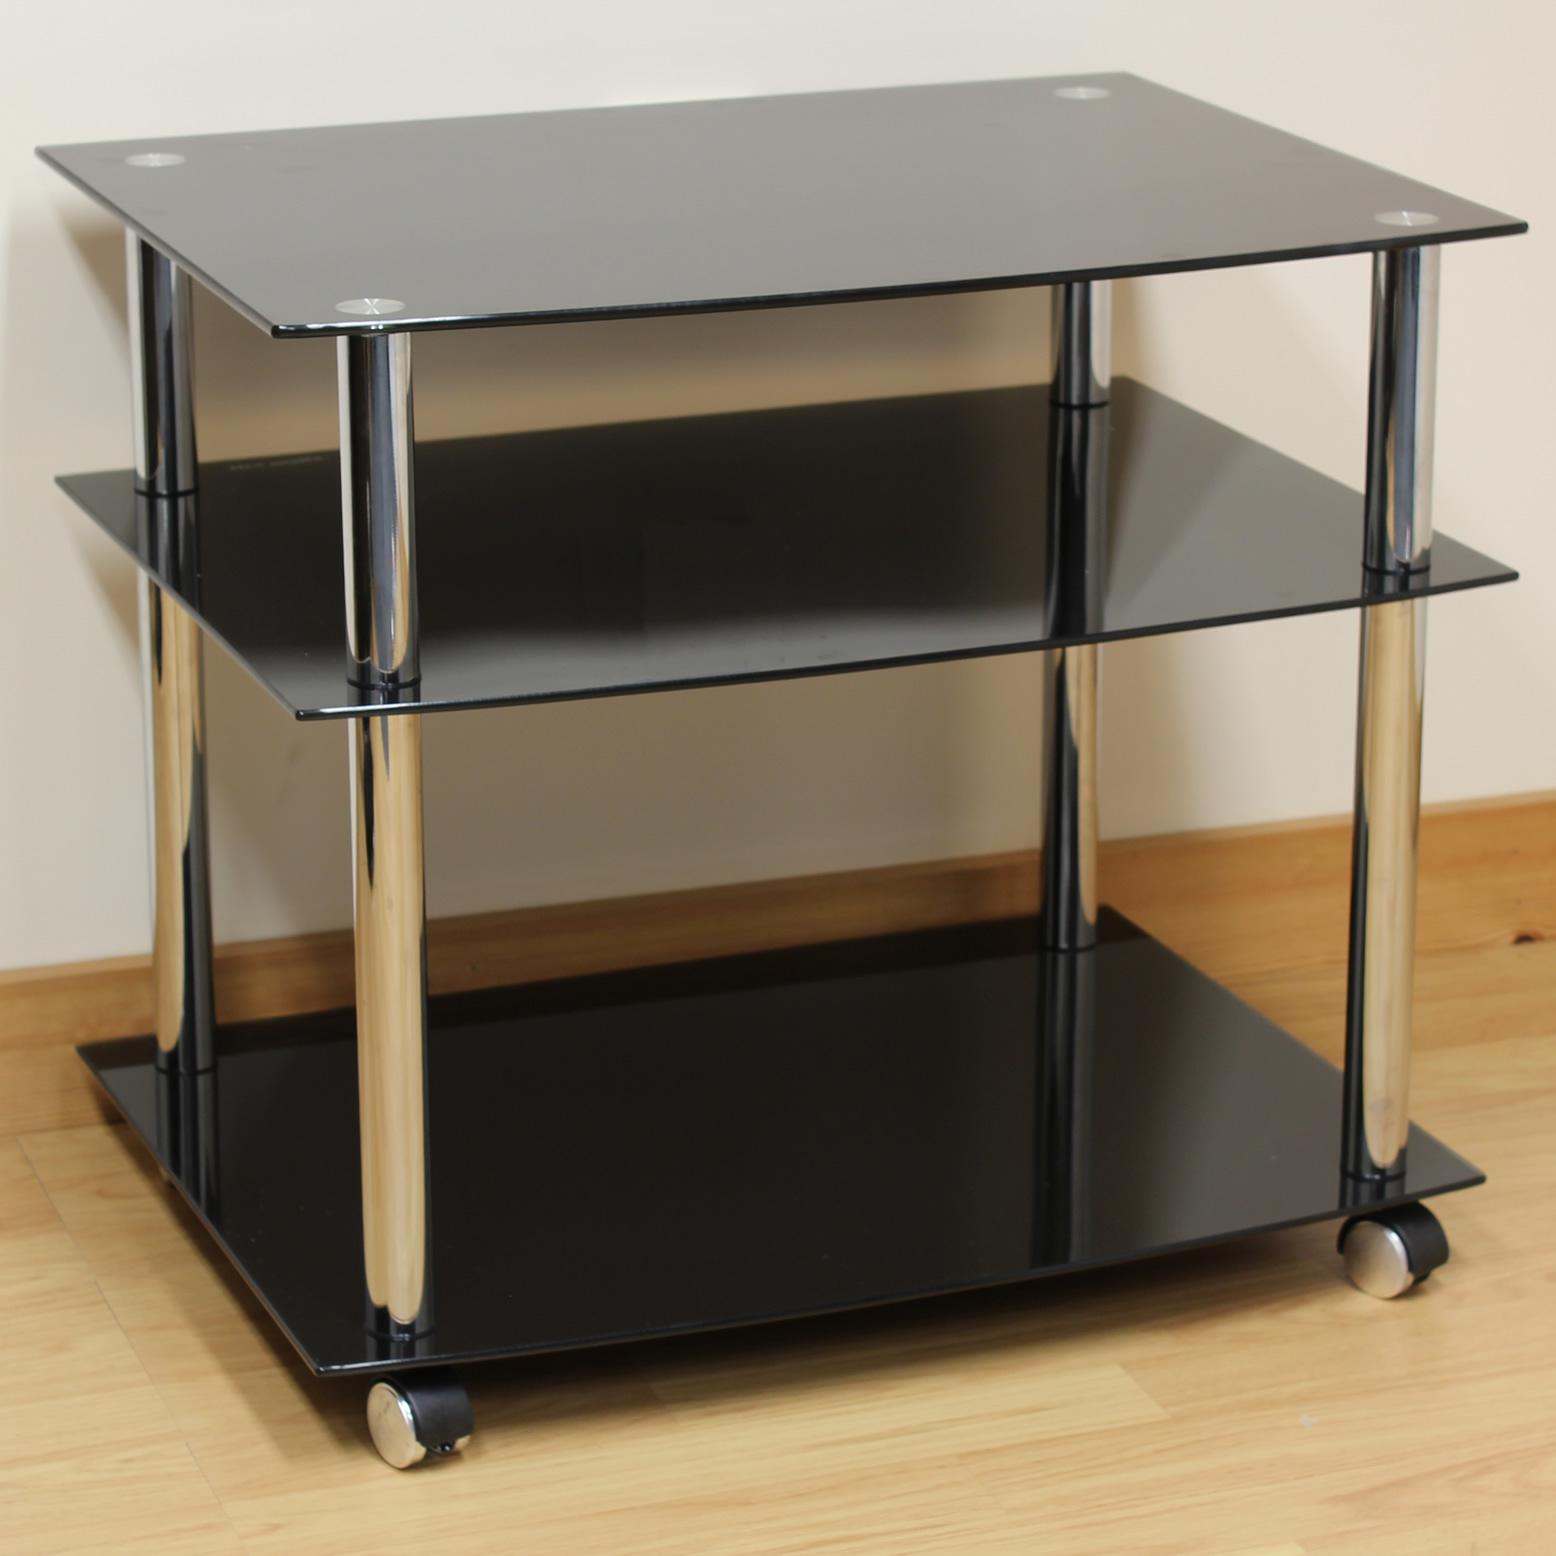 Hartleys Chrome Amp Black Glass 3 Shelf TV Stand Trolley